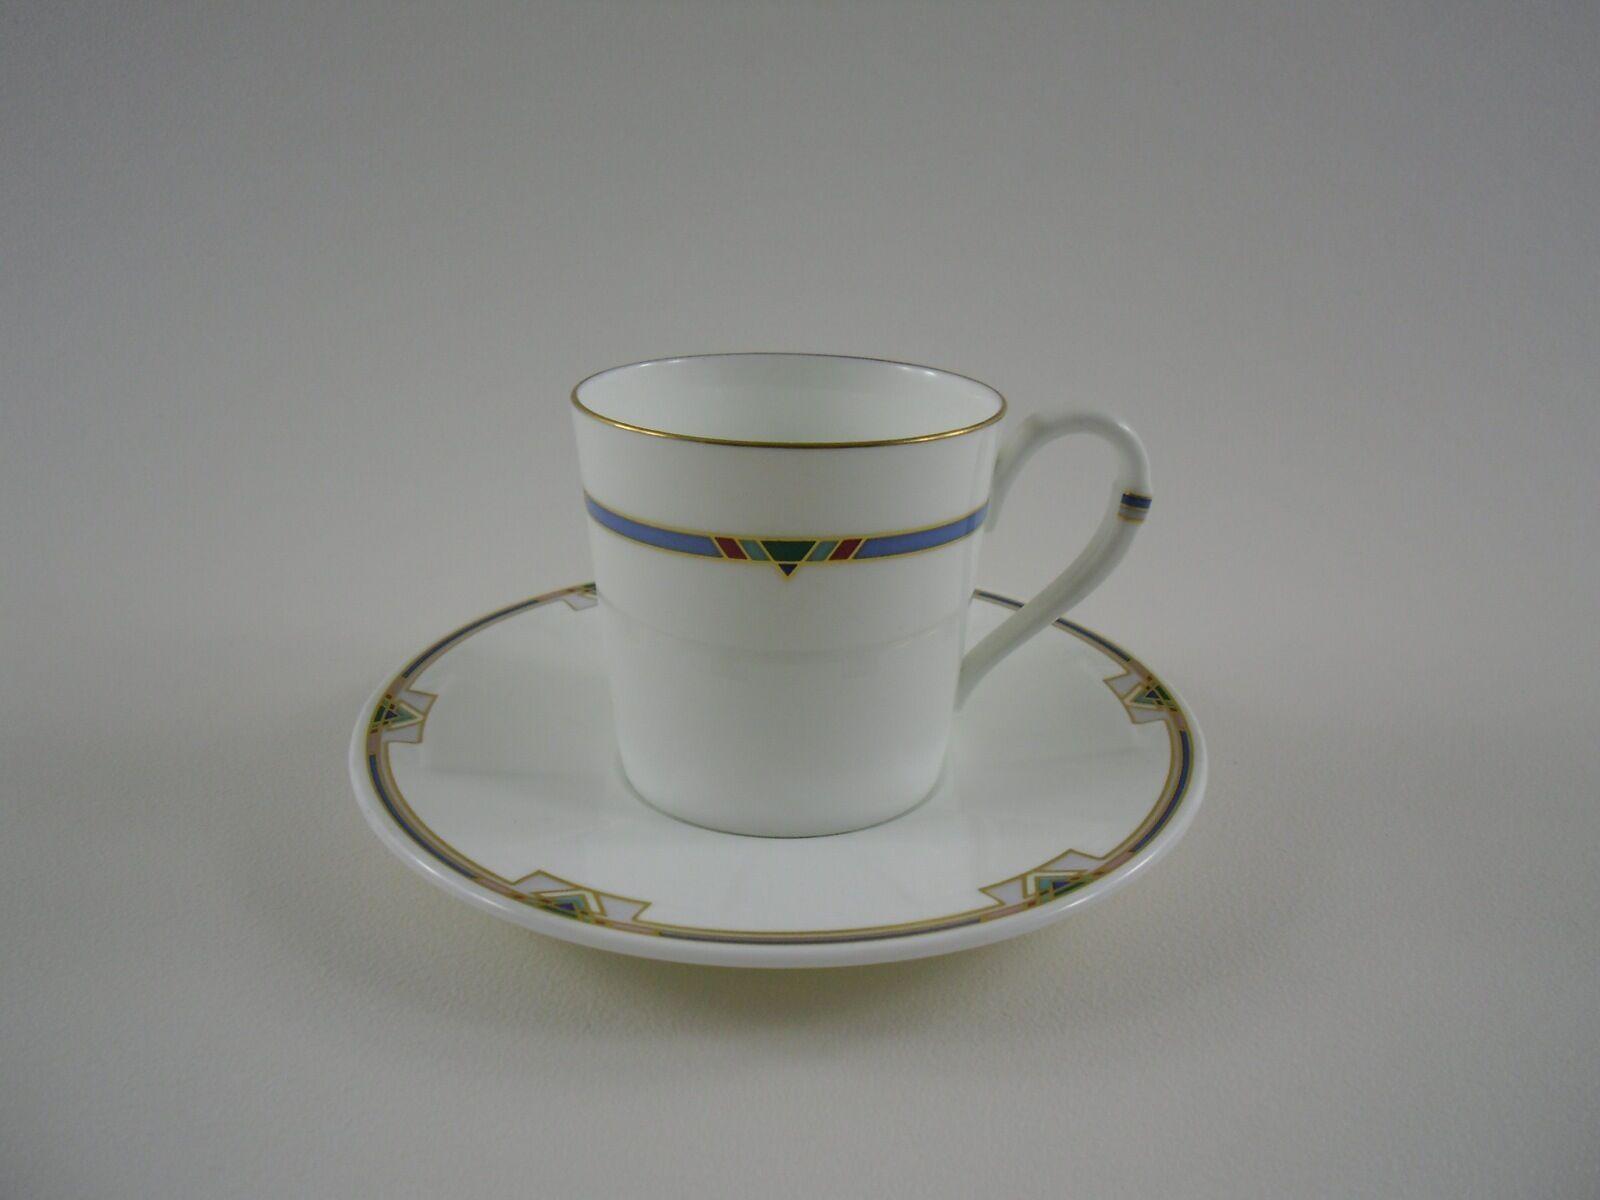 Villeroy & Boch PALOMA PICASSO Park Avenue Kaffeetasse Tasse Untertasse